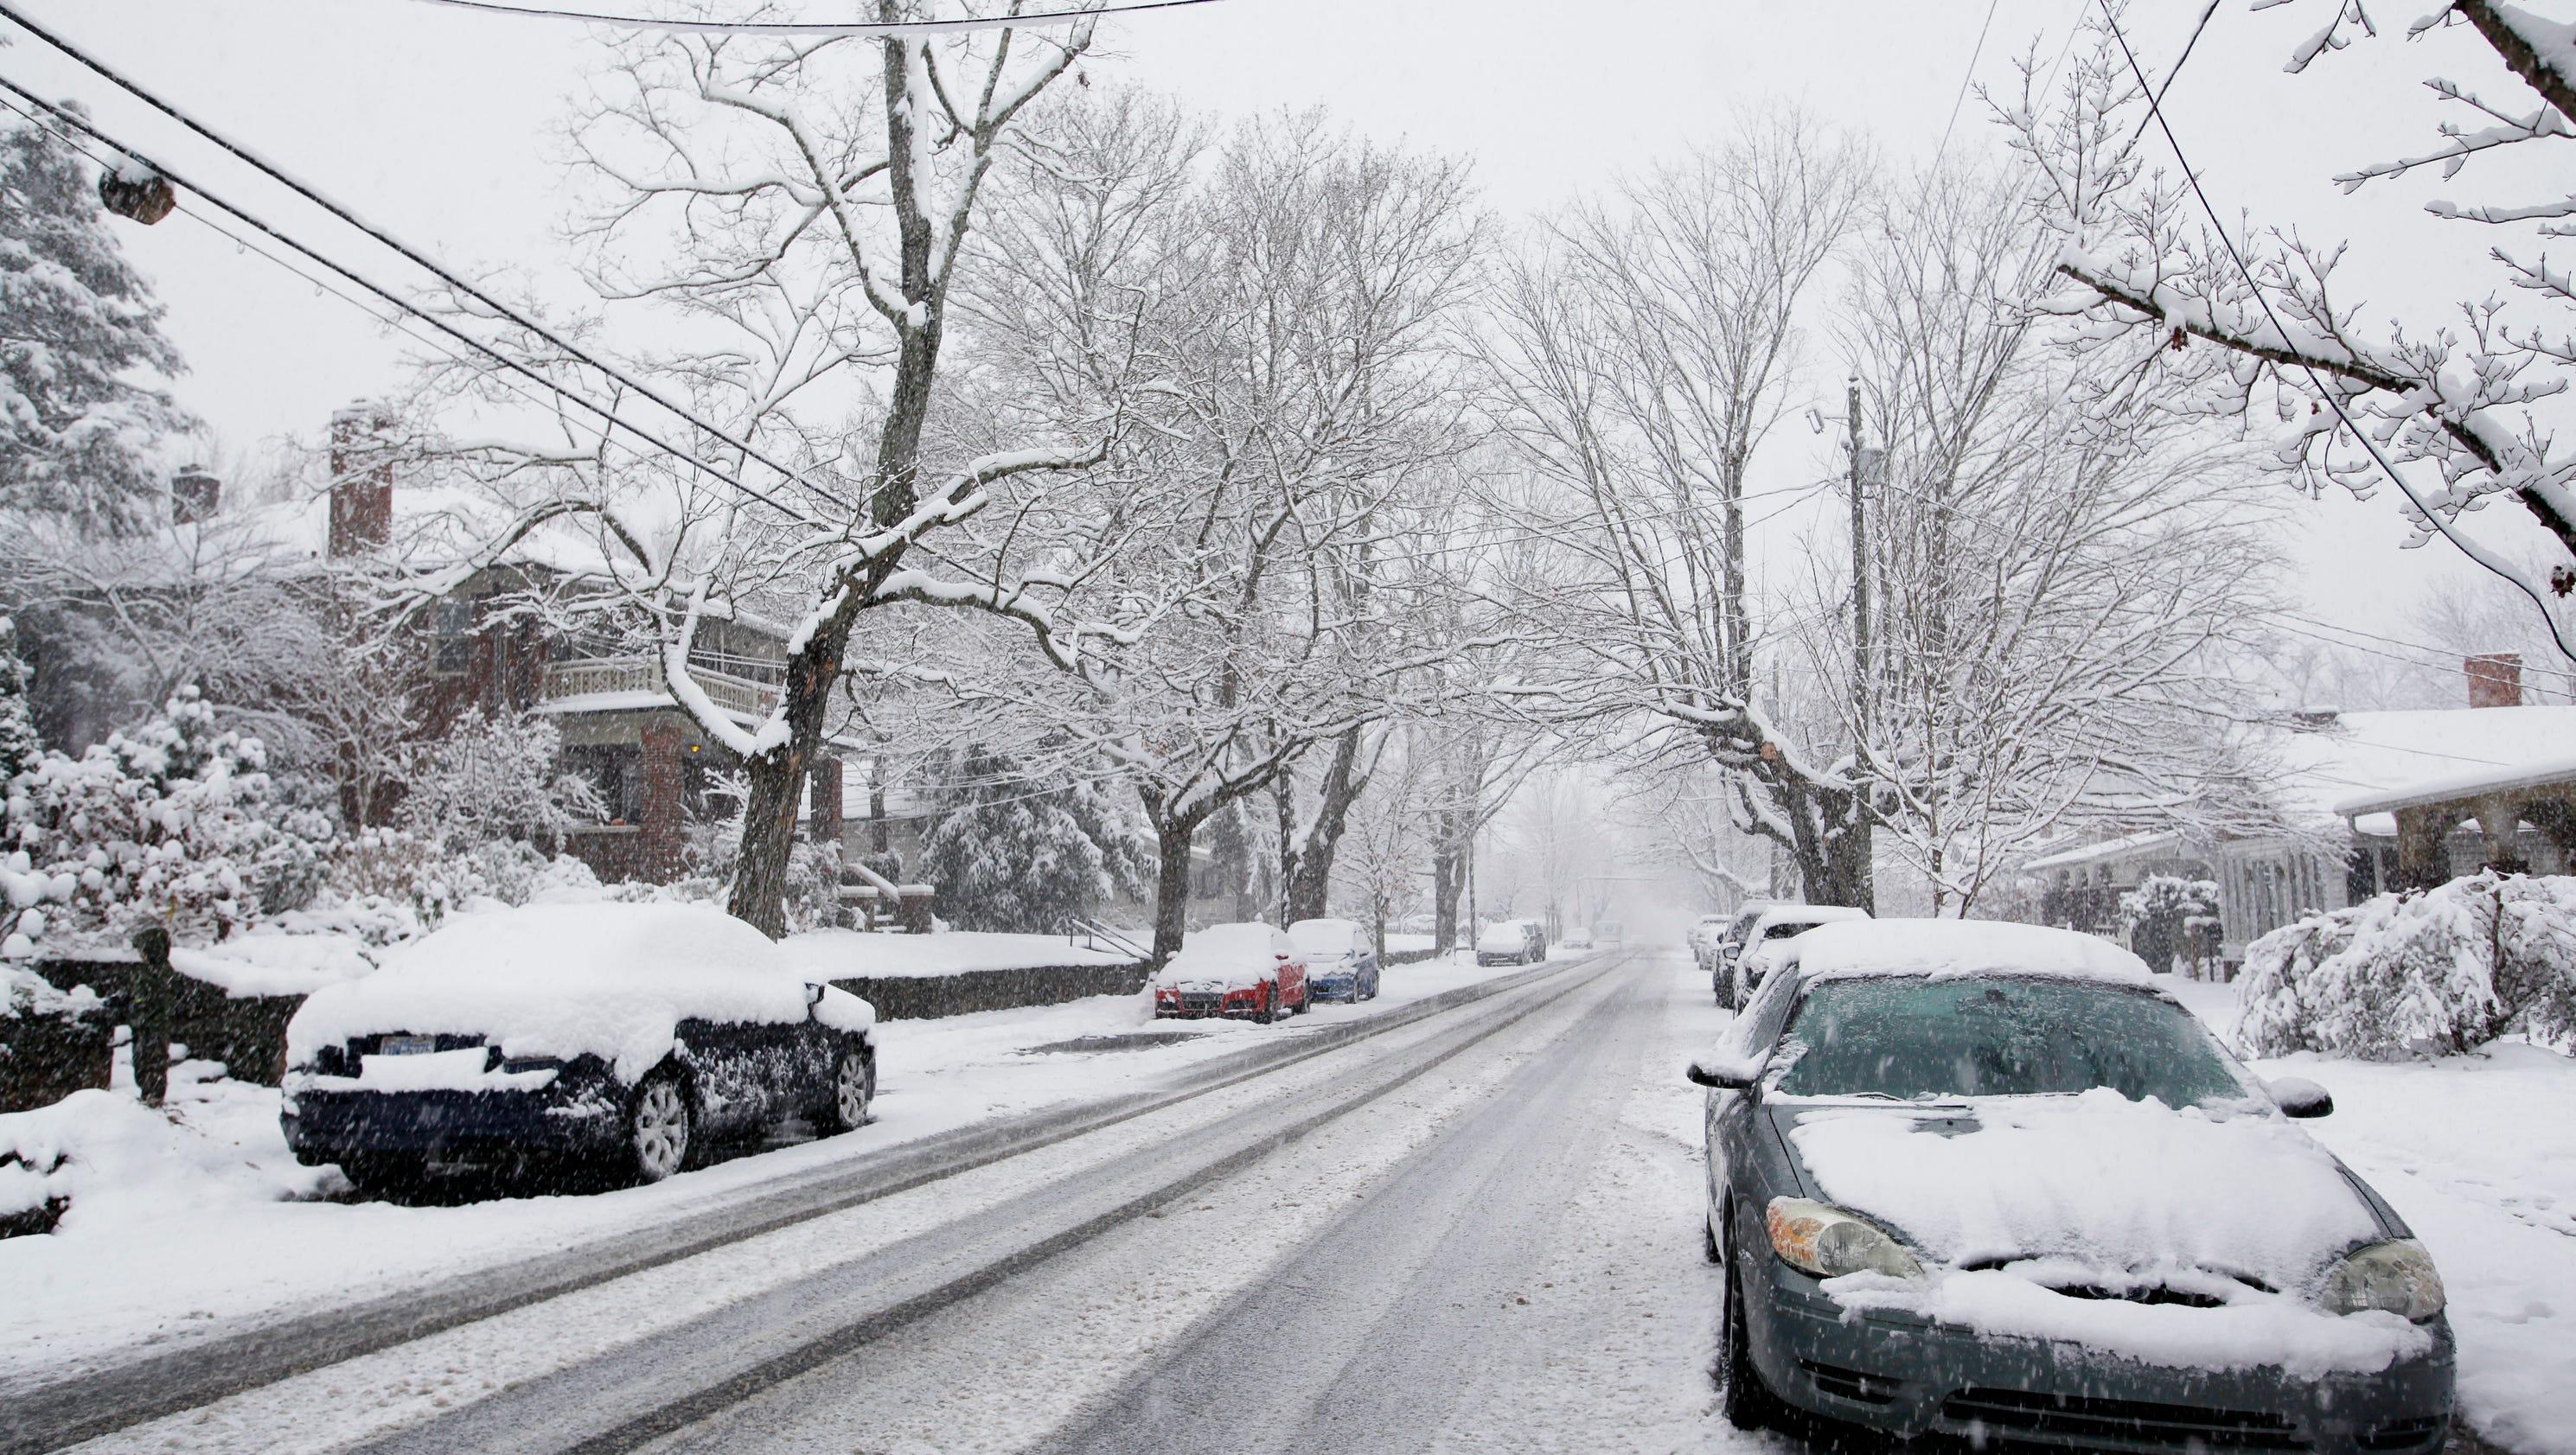 Carolina Cold Snap Wnc Faces Weeks Of Below Normal Temperatures